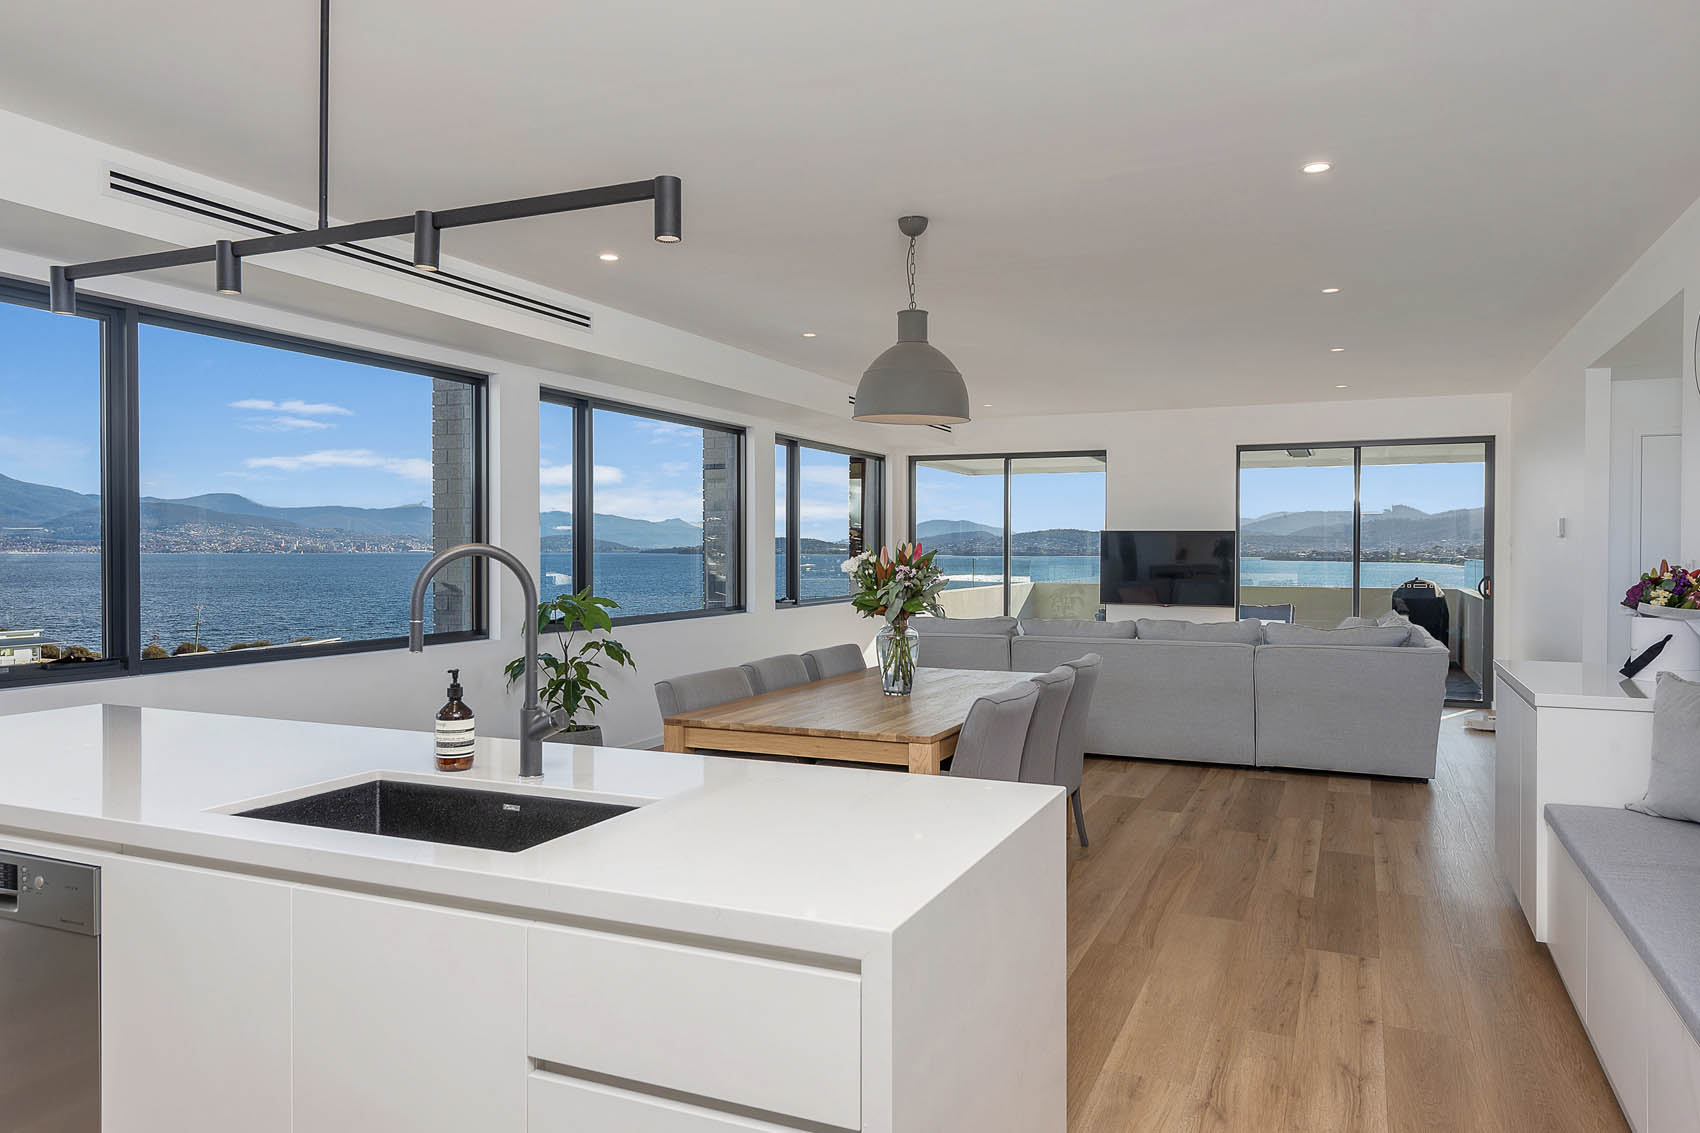 andrew-lyden-new-home-builder-hobart-tasmania-cambridge-5